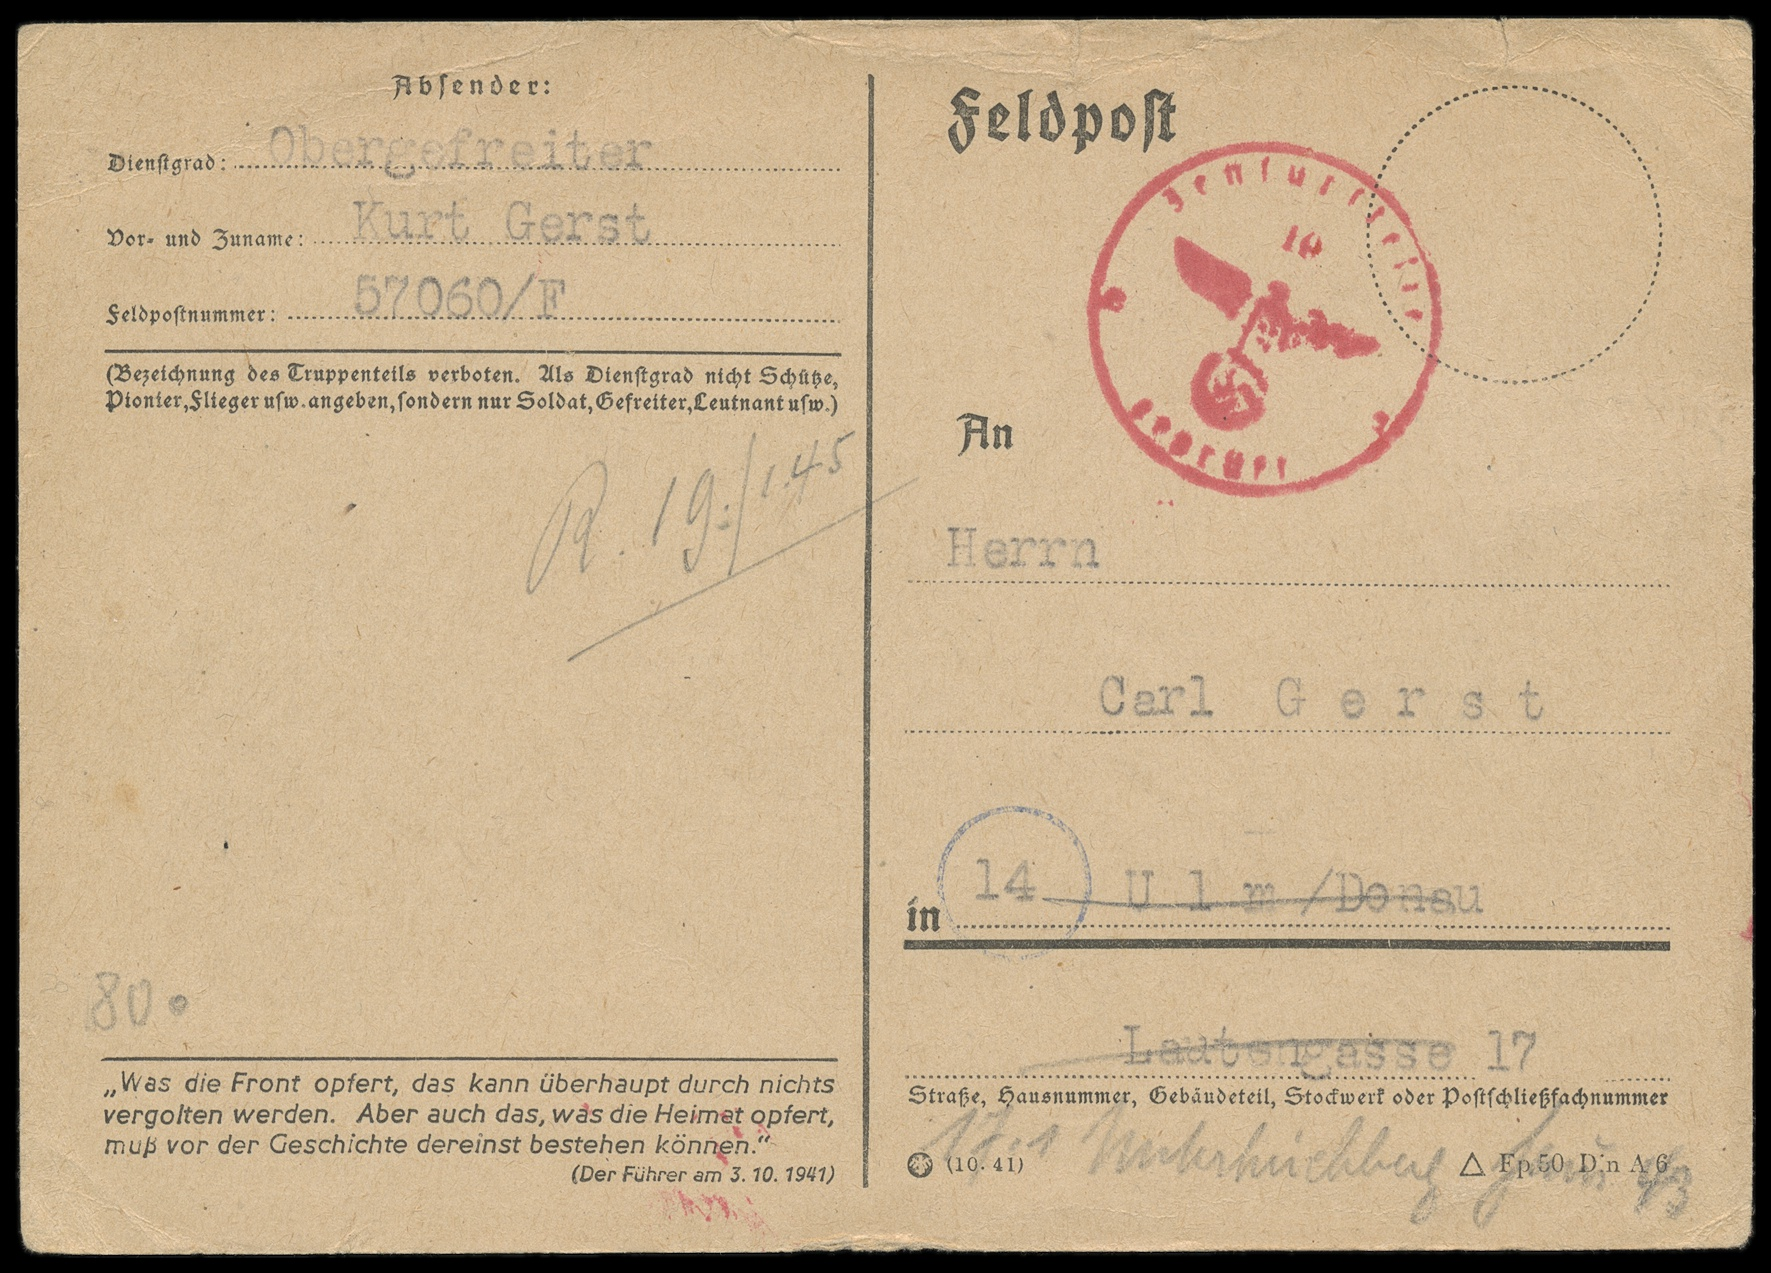 Lot 2909 - Main catalogue feldpost 2. weltkrieg -  Peter Harlos Auctions 42. Harlos Auktion